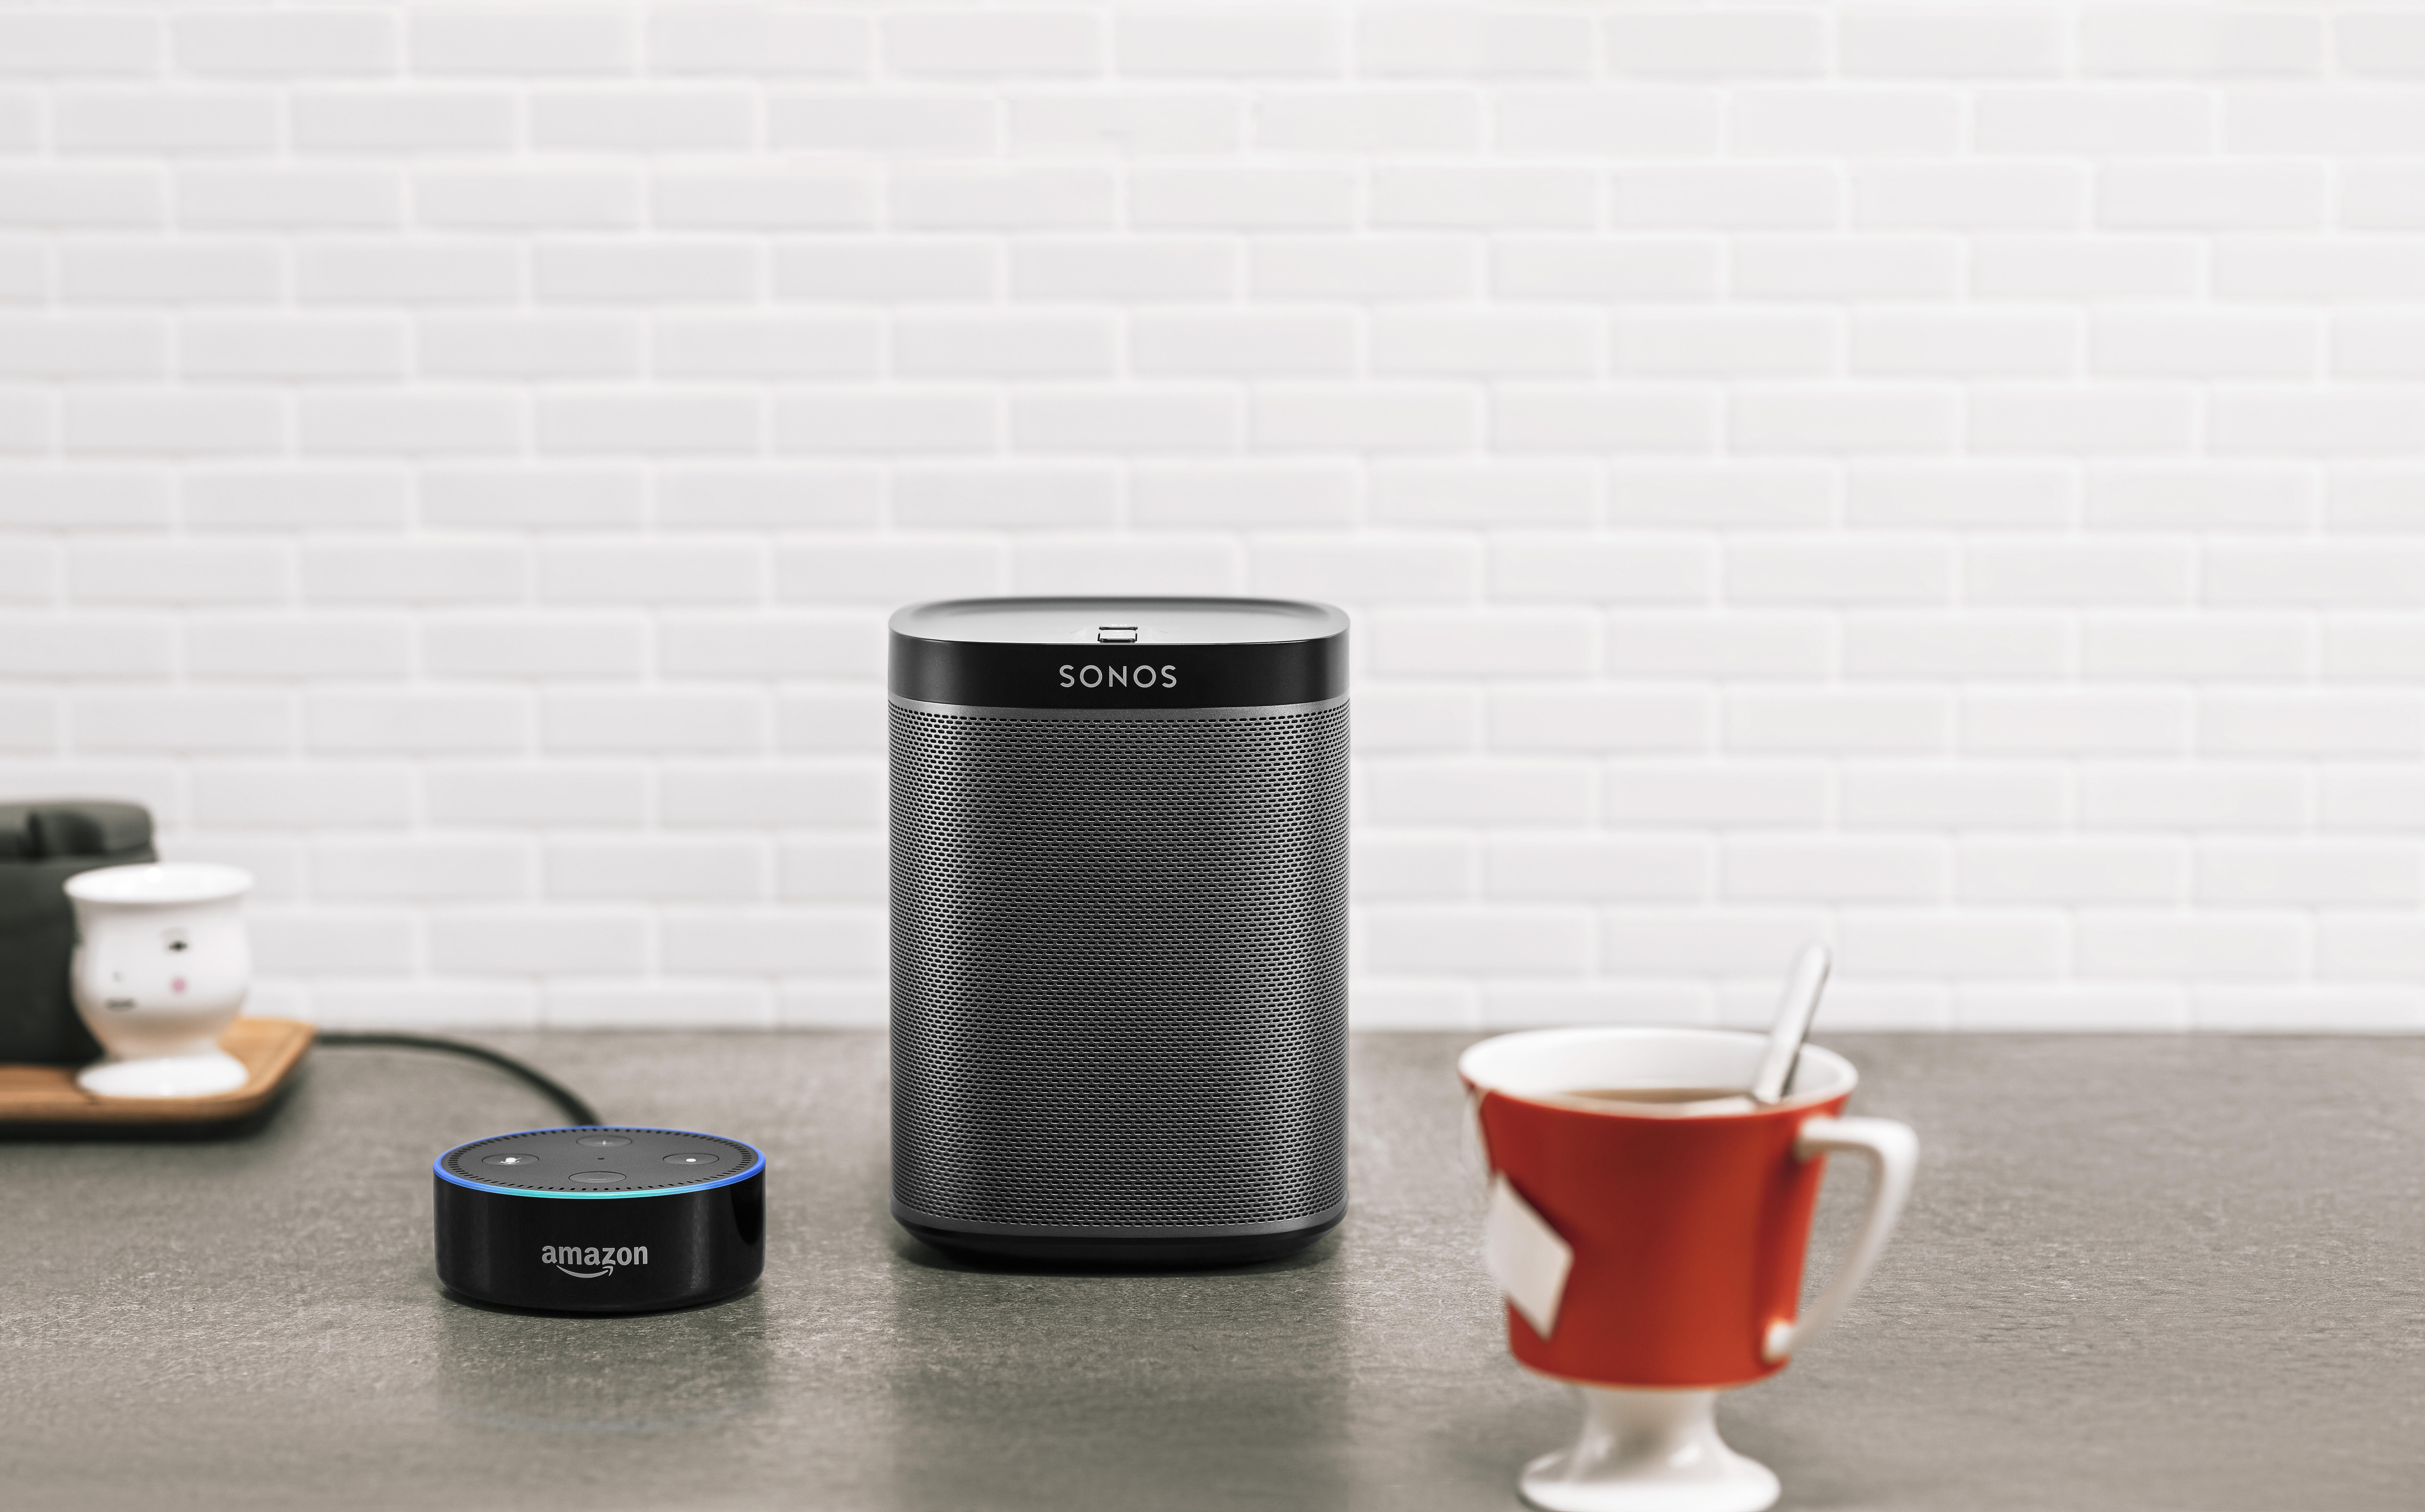 sonos alexa commands how to smart home geeks. Black Bedroom Furniture Sets. Home Design Ideas